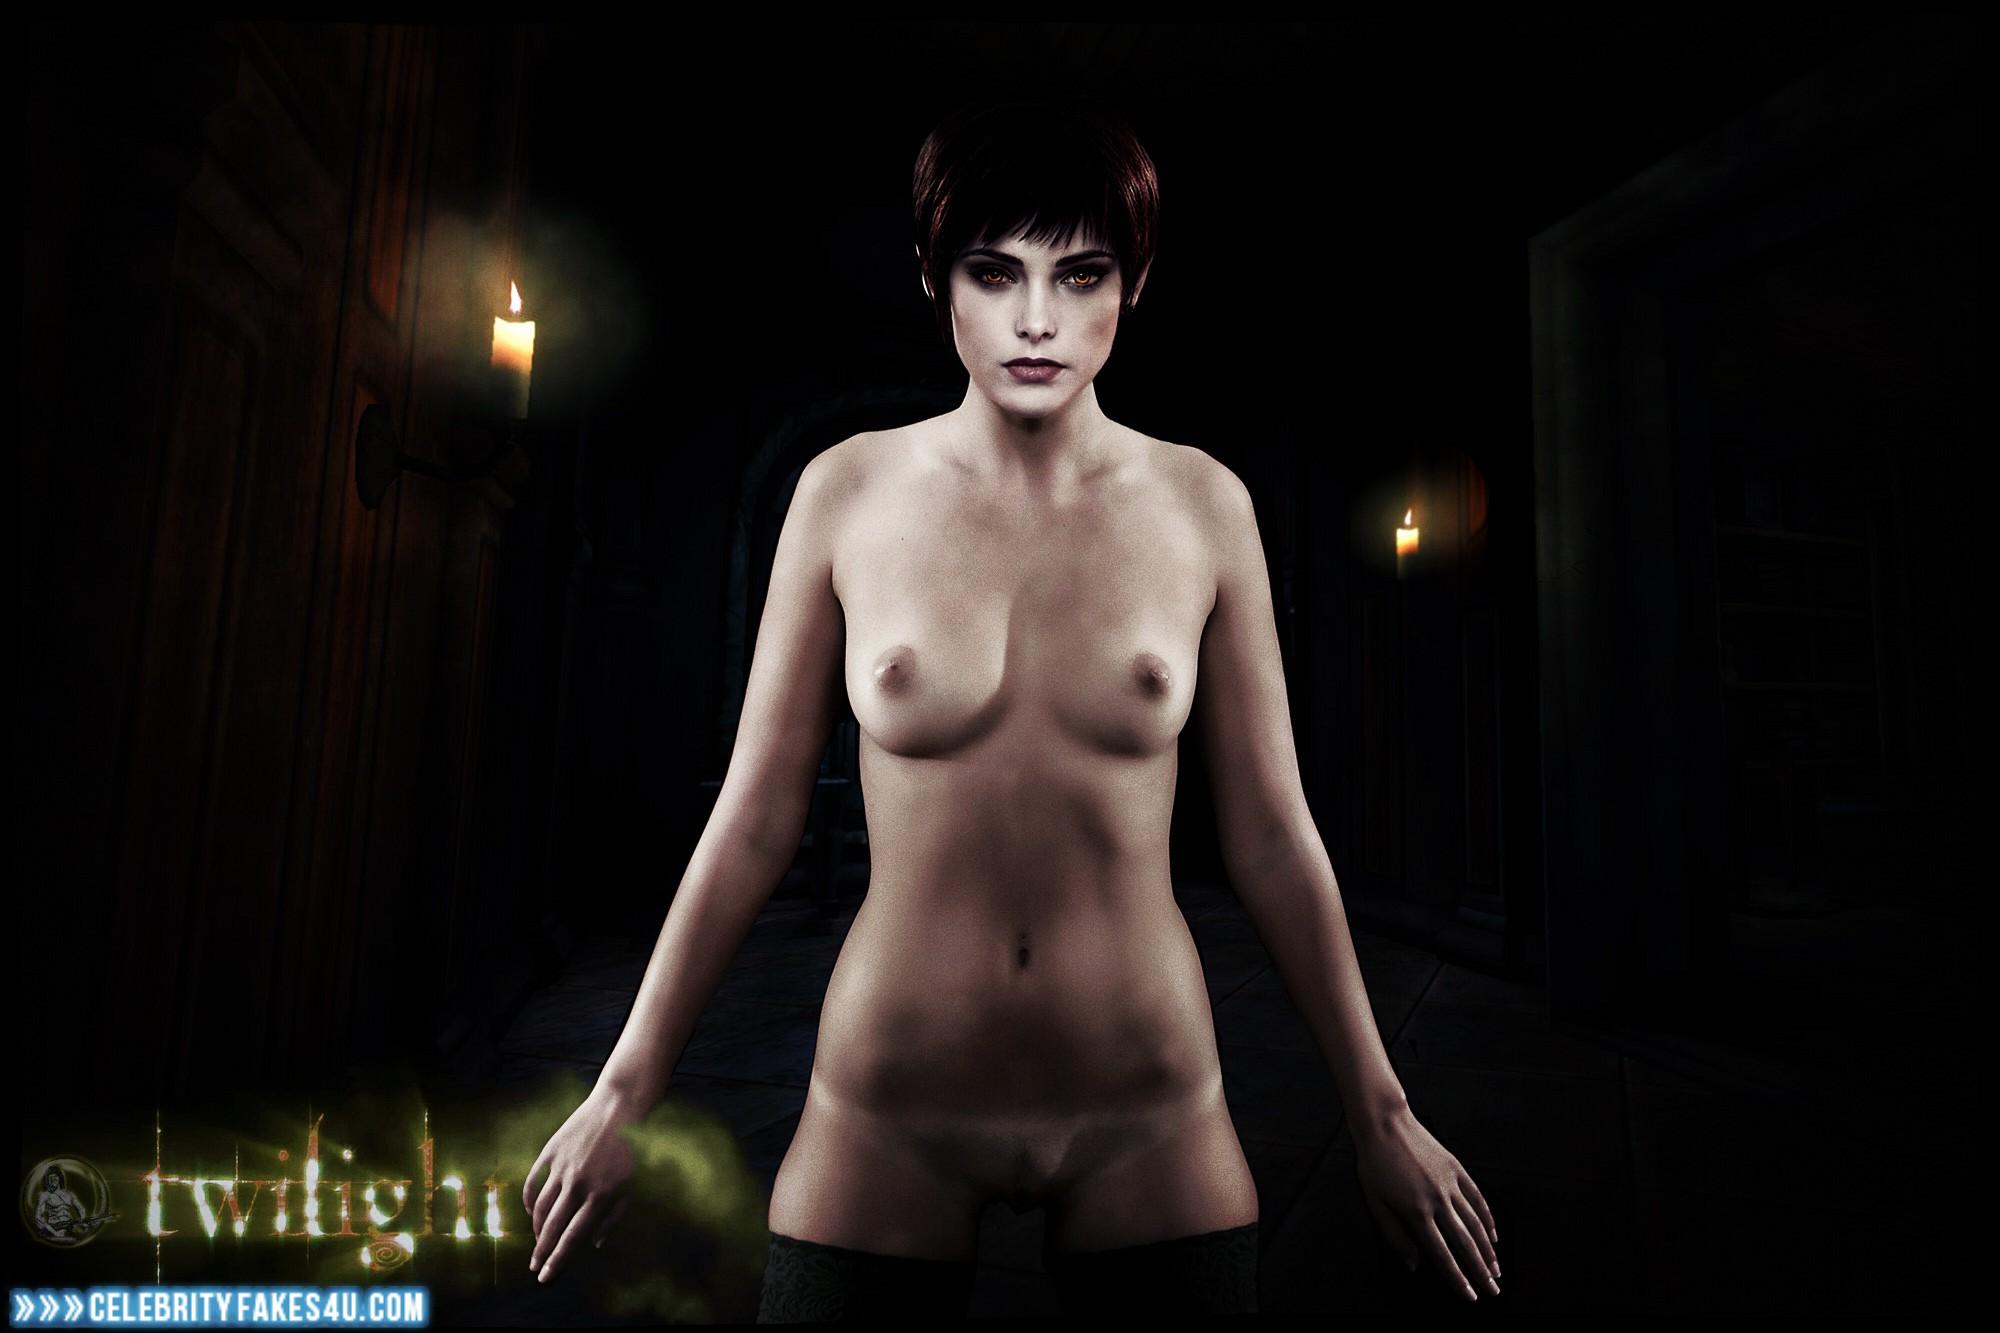 Naked hispanic woman hot